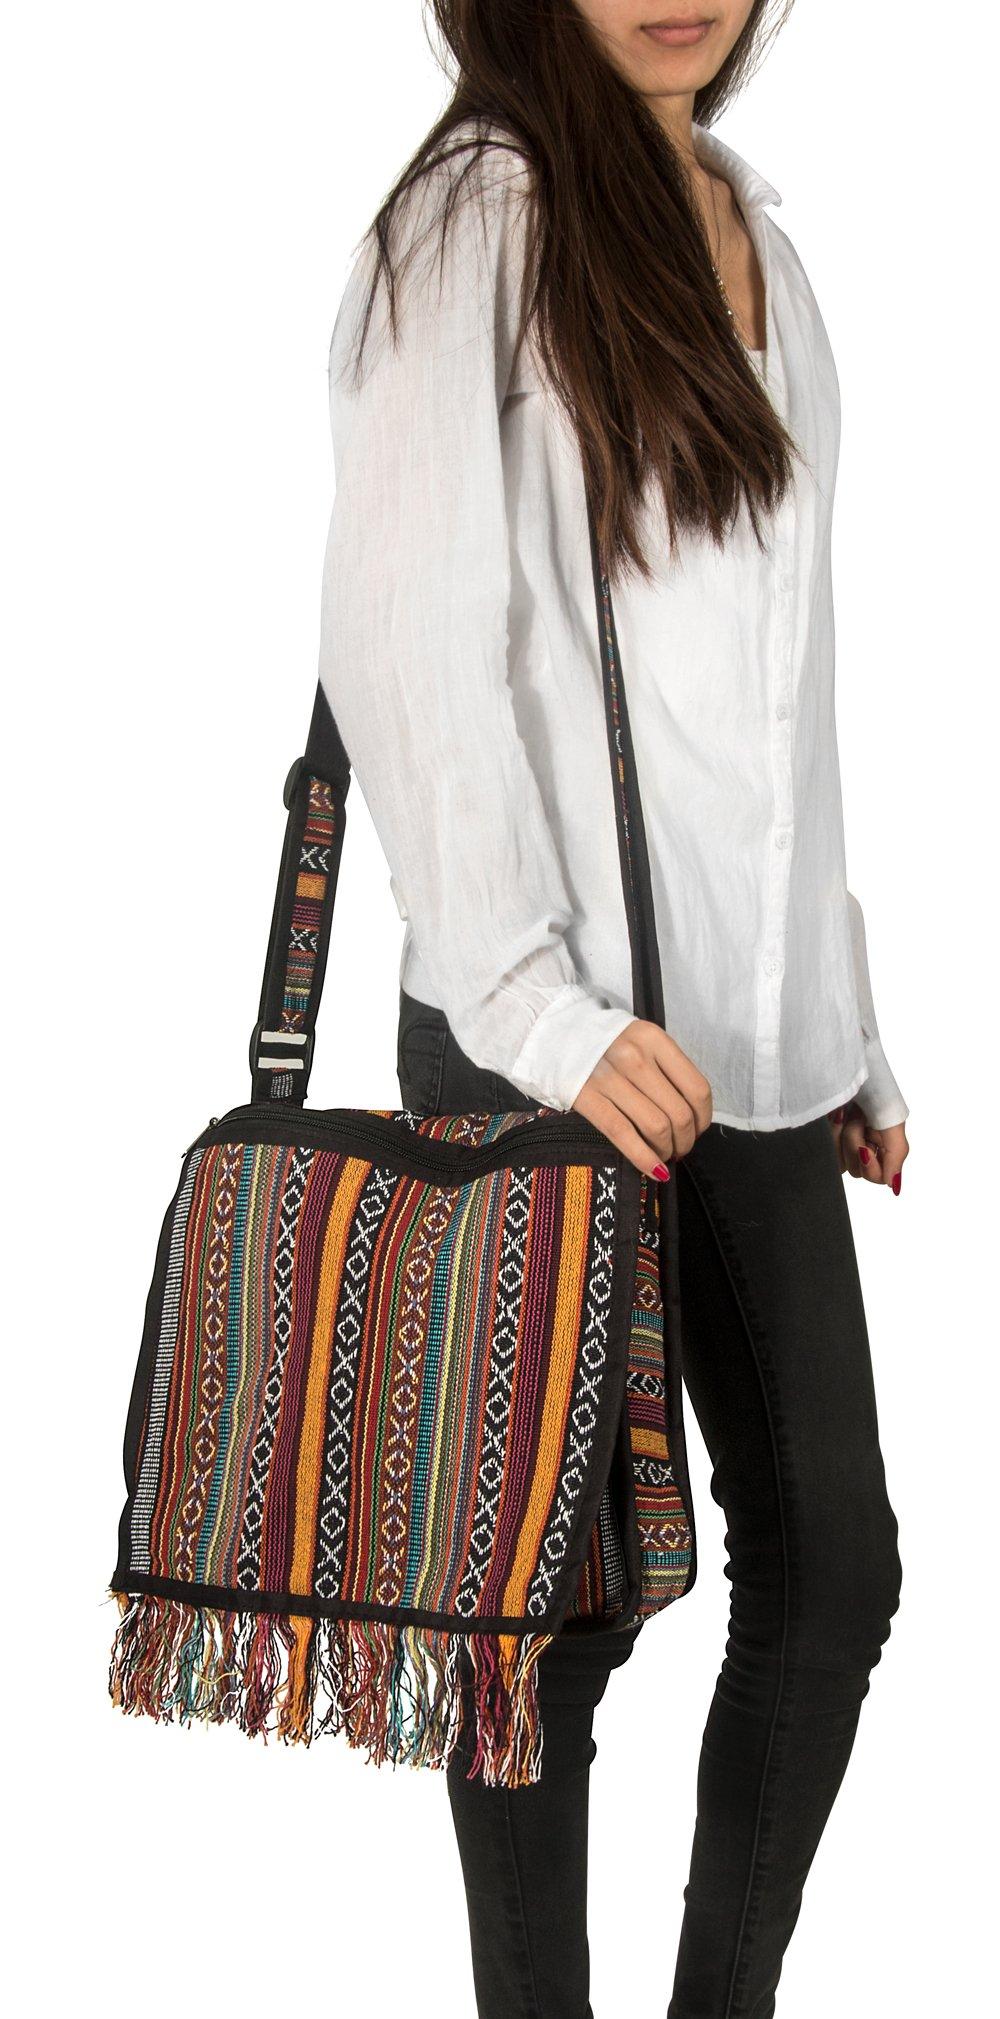 Tribe Azure Woven Adjustable Strap Shoulder Bag Hobo Messenger Women Fashion Handbag Unique Roomy Tassel (Woven Red)